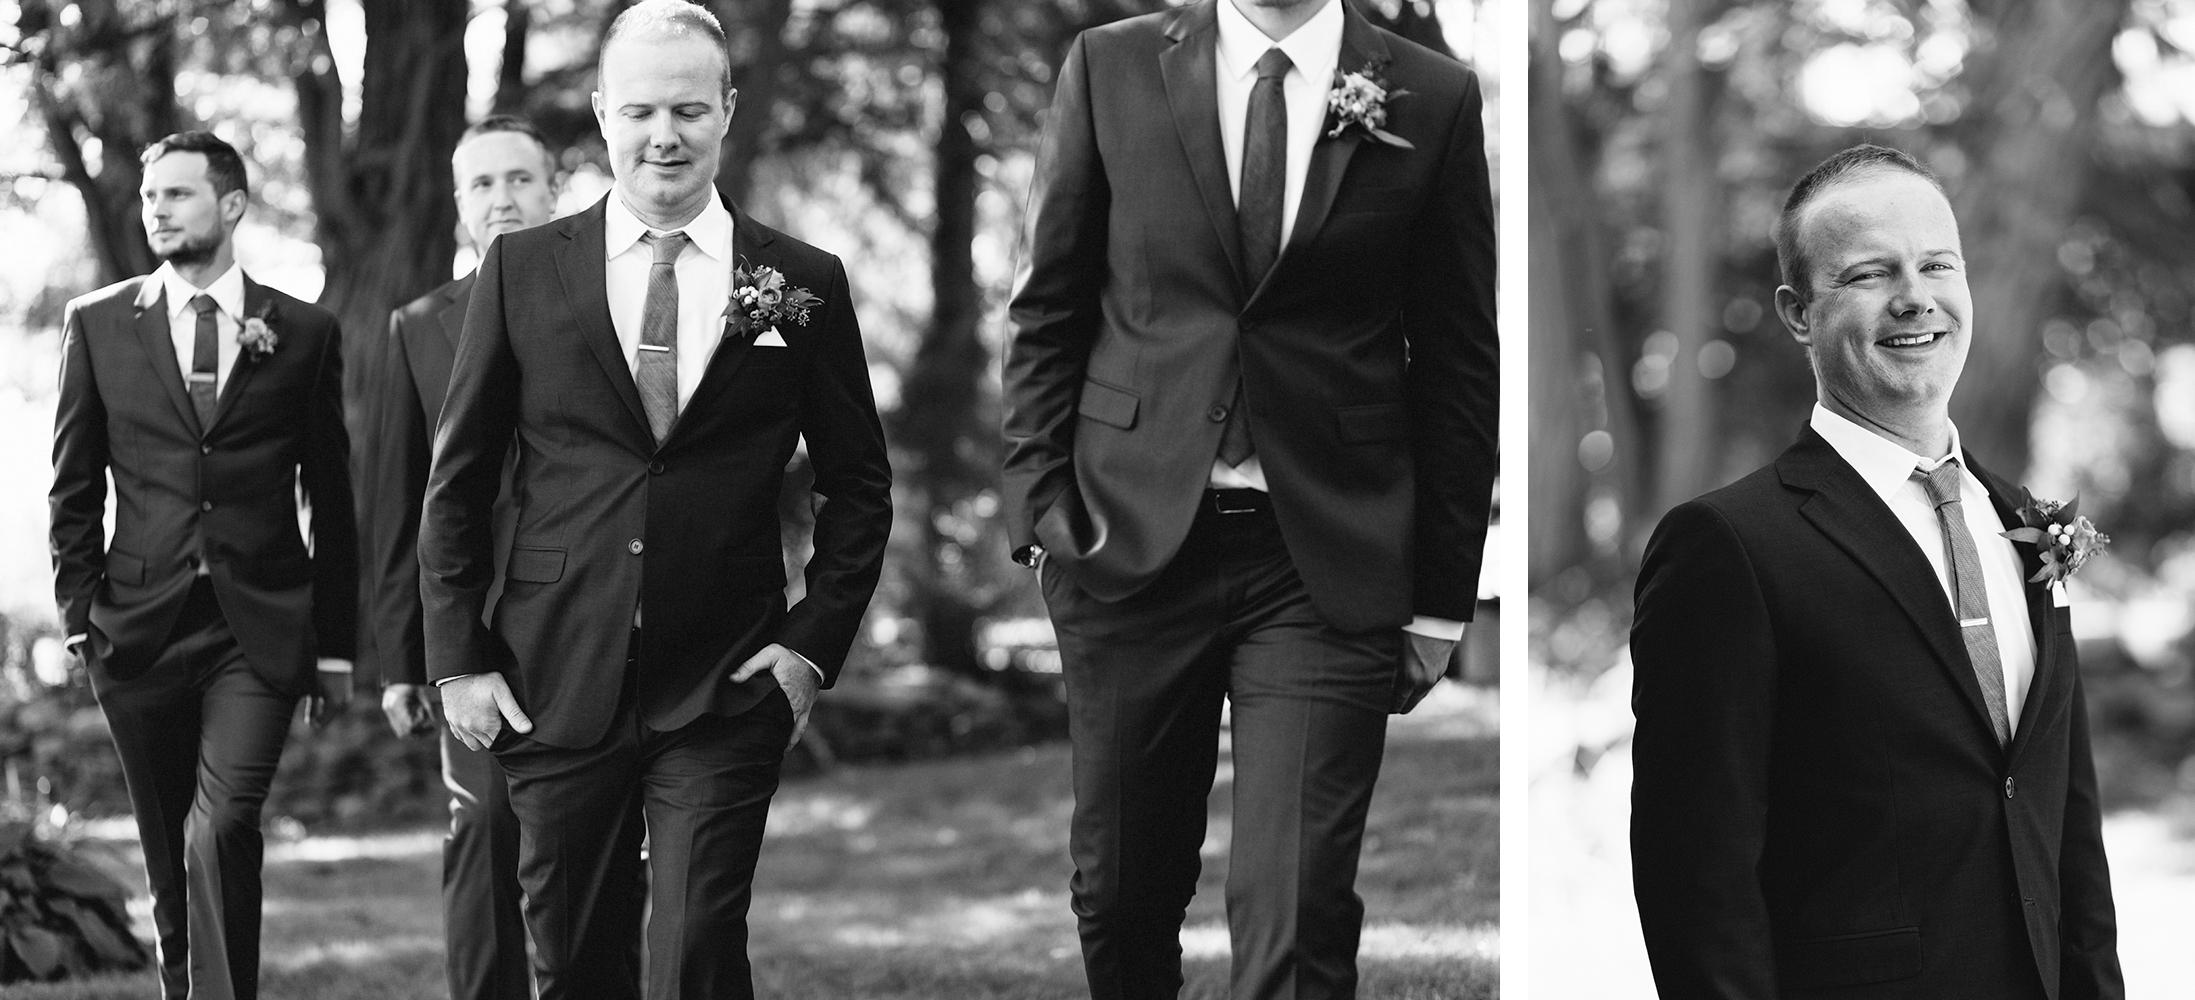 7-Groom-portrait-At-Egaridge-Resort-Venue-Muskoka-Ontario-Wedding-Photography-by-Ryanne-Hollies-Photography-Toronto-Documentary-Wedding-Photographer.jpg